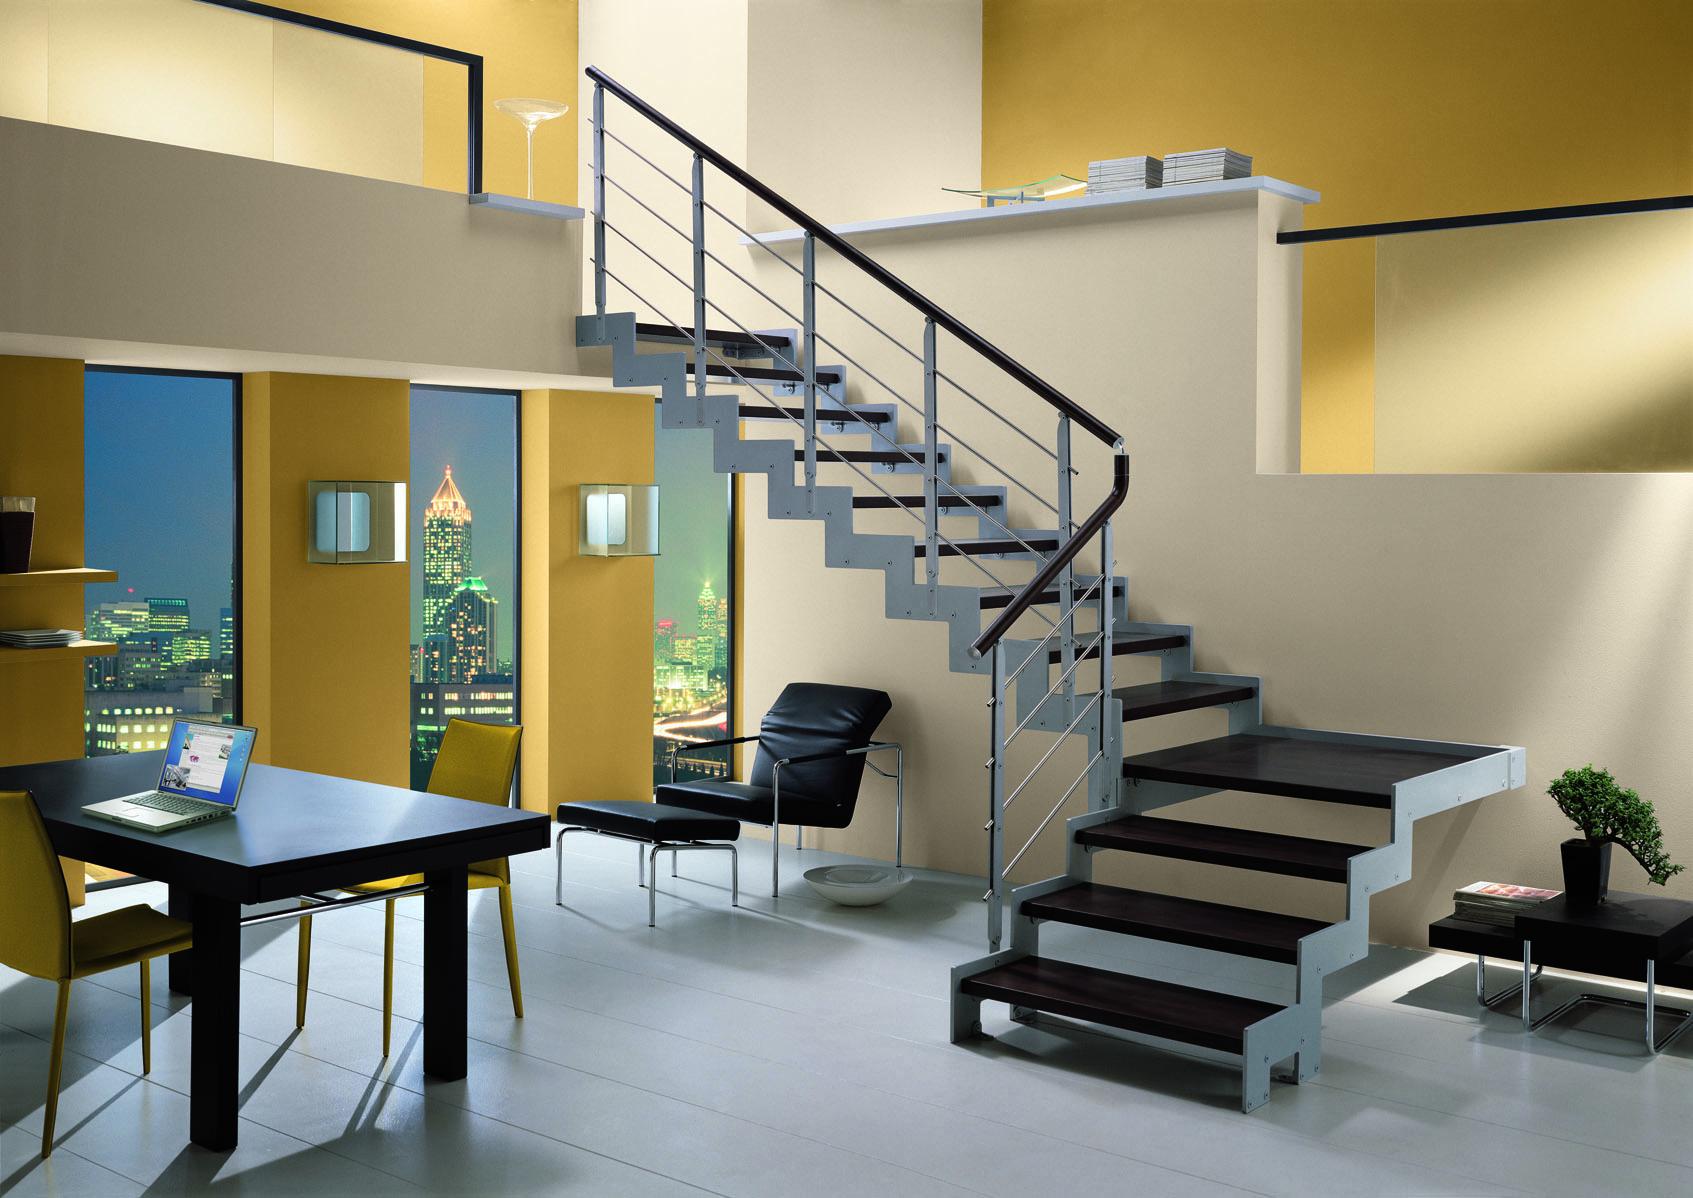 Modelos de escadas 5 super modelos de escadas para sua casa for Modelos de escaleras internas para casas